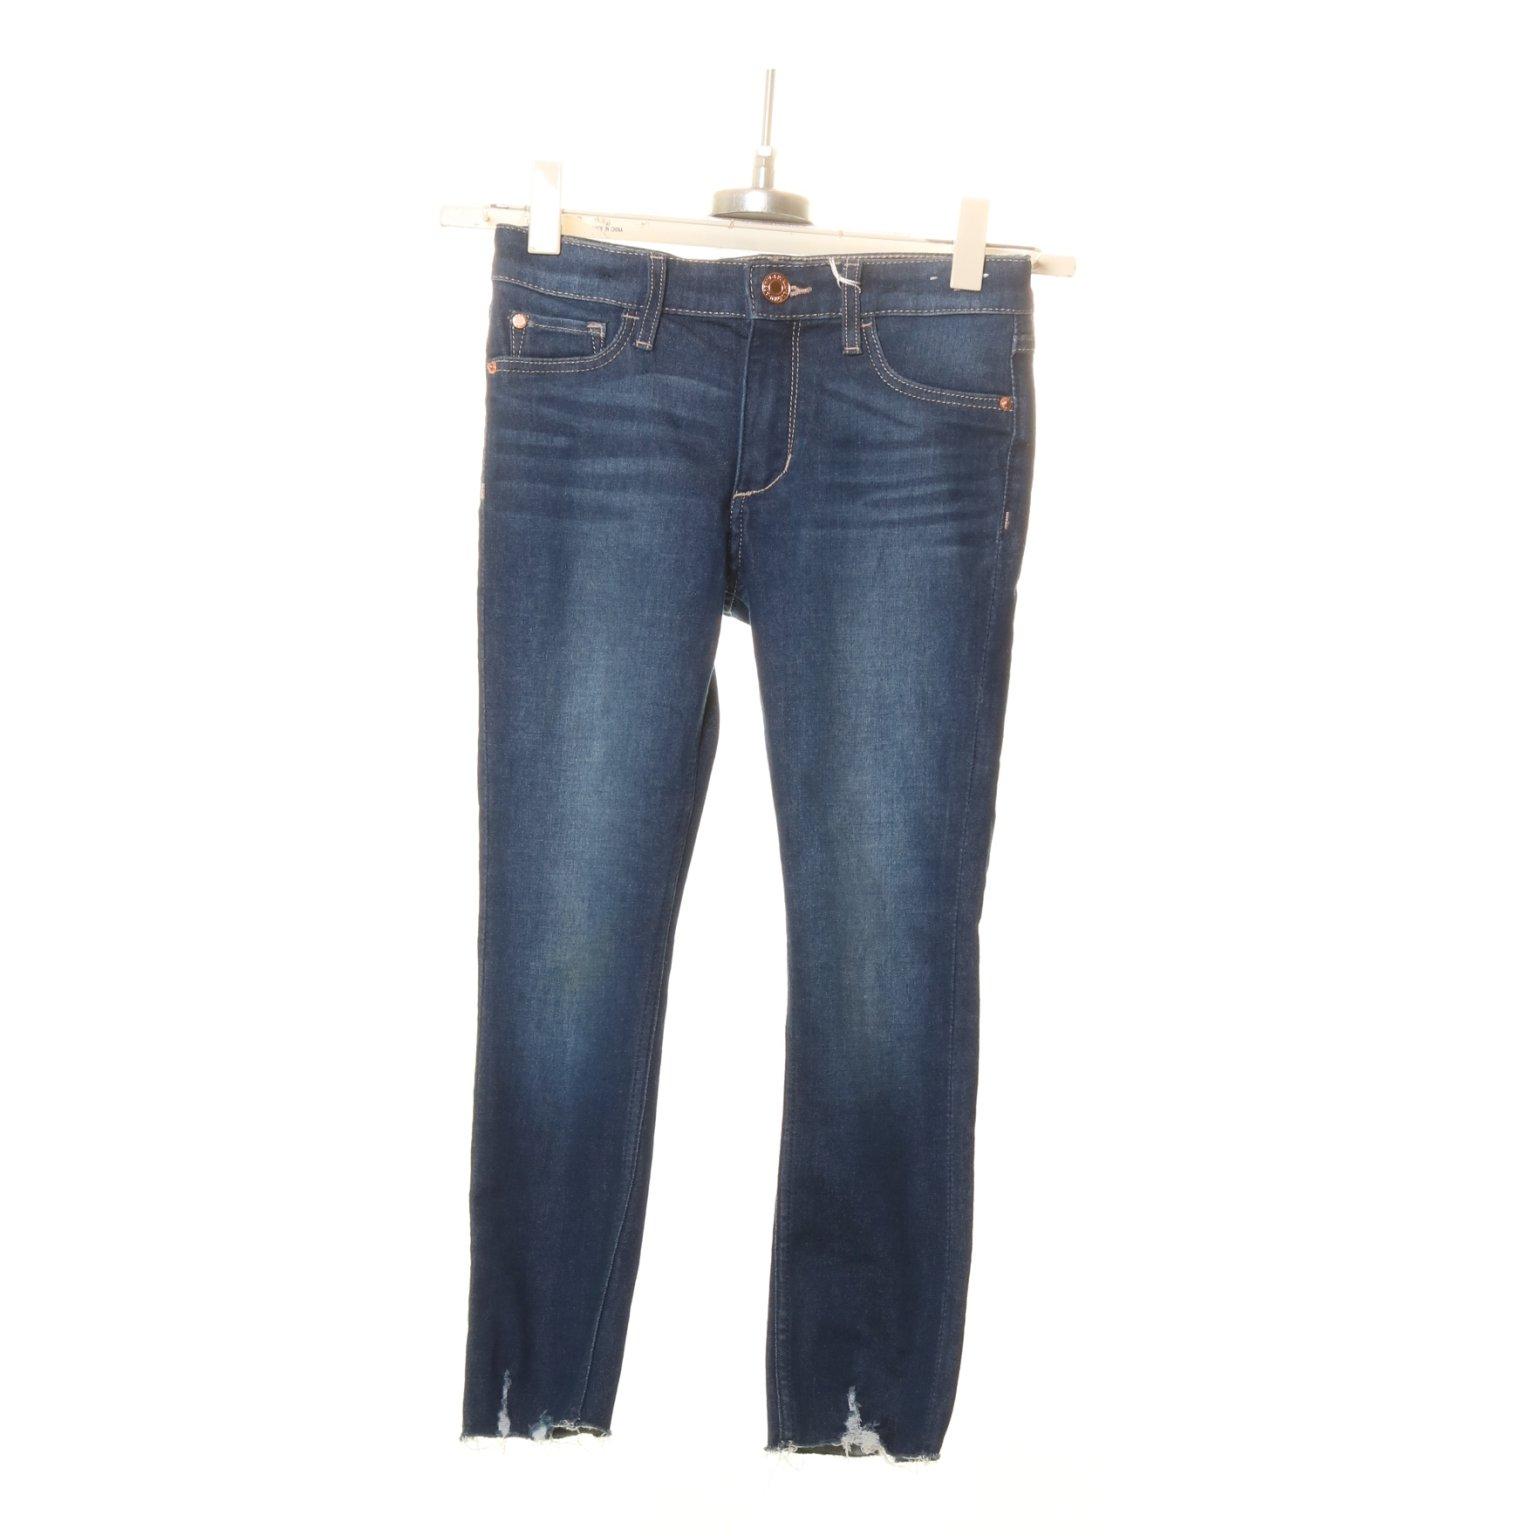 &Denim by H&M, Jeans, Strl: 29/32, Skinny.. (406853588) ᐈ